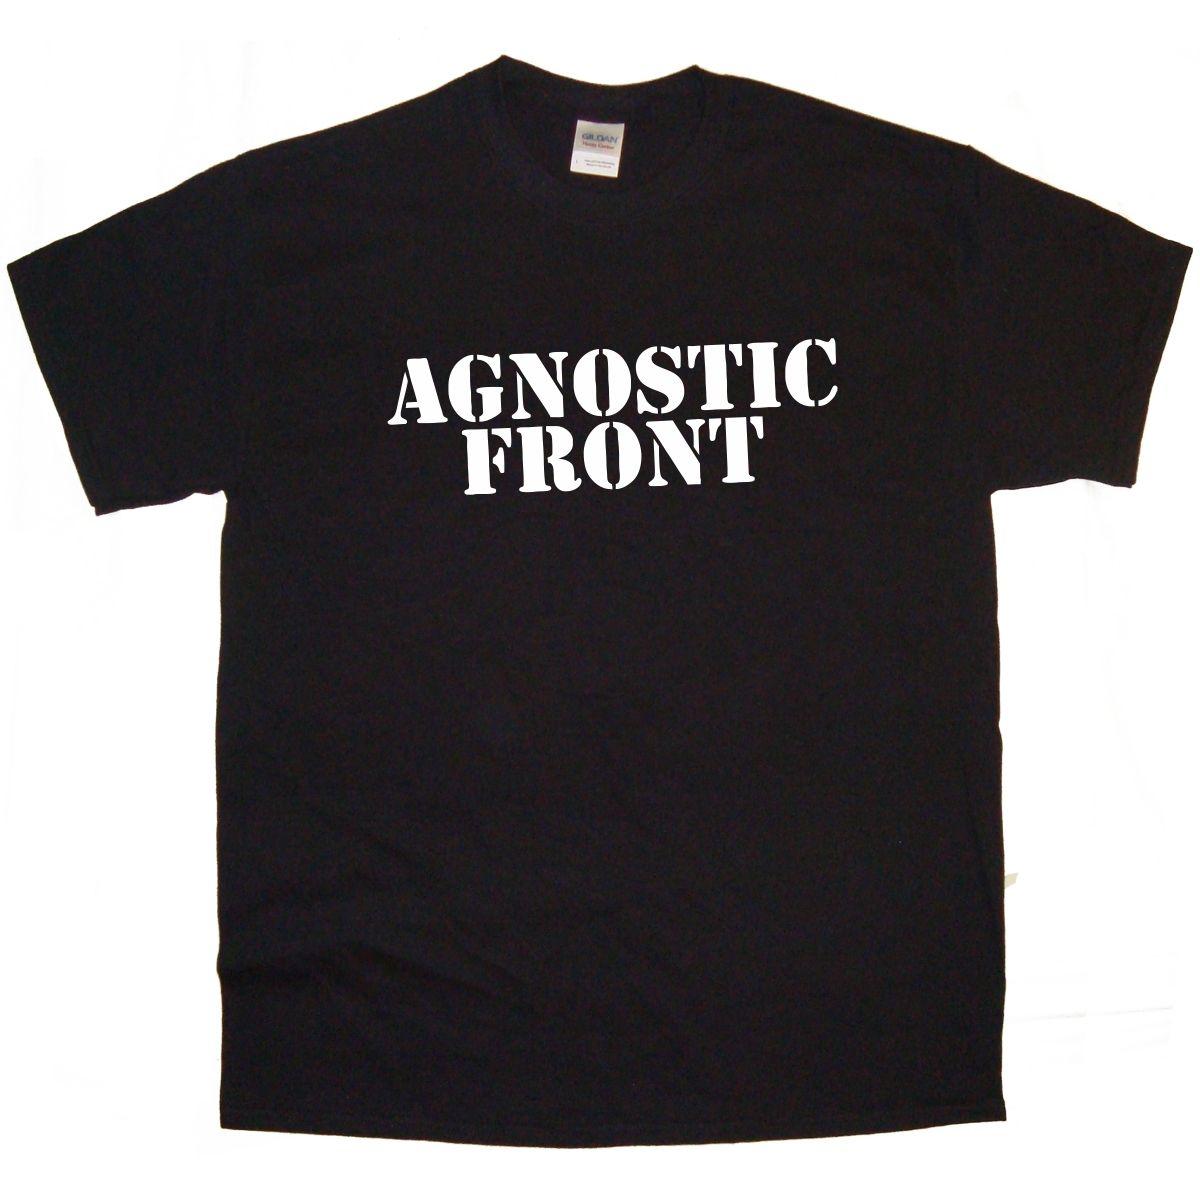 AGNOSTIC FRONT Band logo Rock Thrash Black DEATH HEAVY METAL PUNK POP t shirt summer tshirt(China (Mainland))